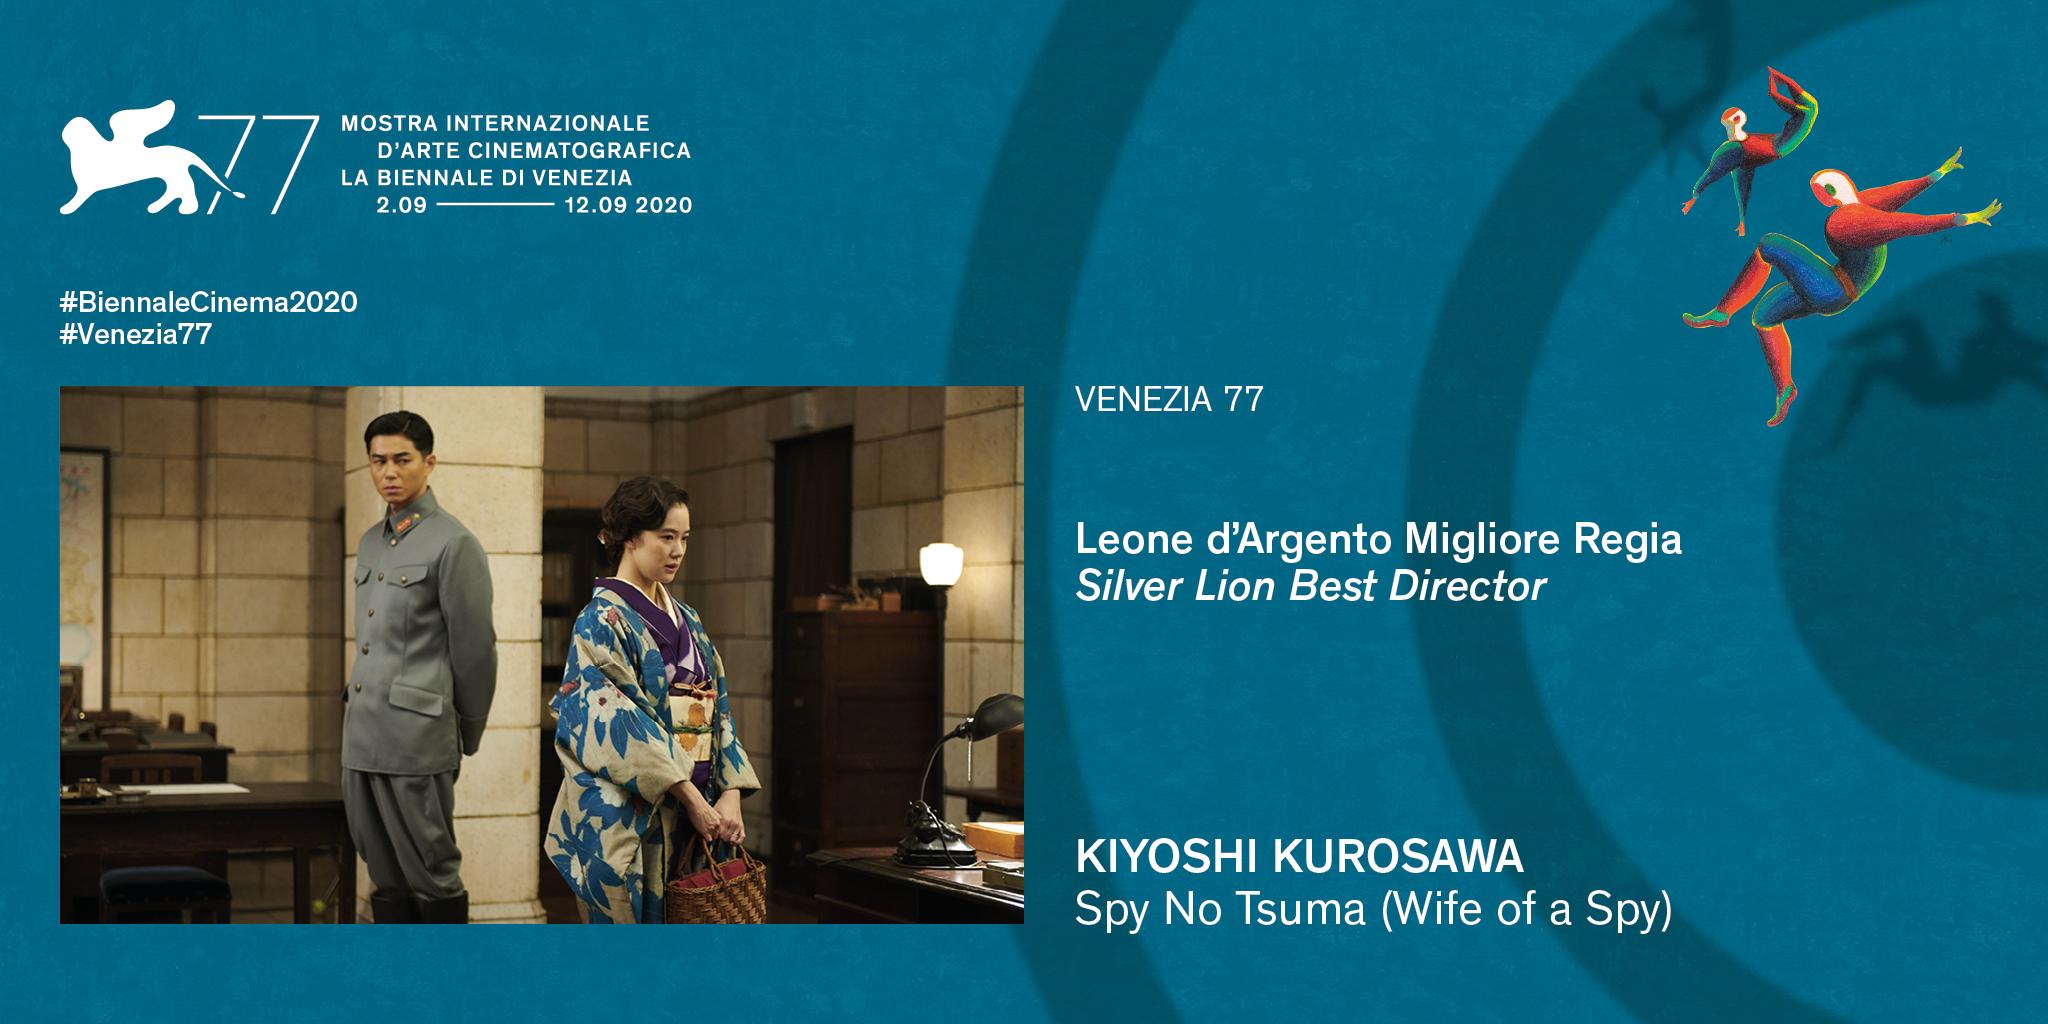 La mujer del espía (Spy no Tsuma) film - Kiyoshi Kurosawa - 77 Festival Internacional de Cine de Venecia (Biennale di Venezia)